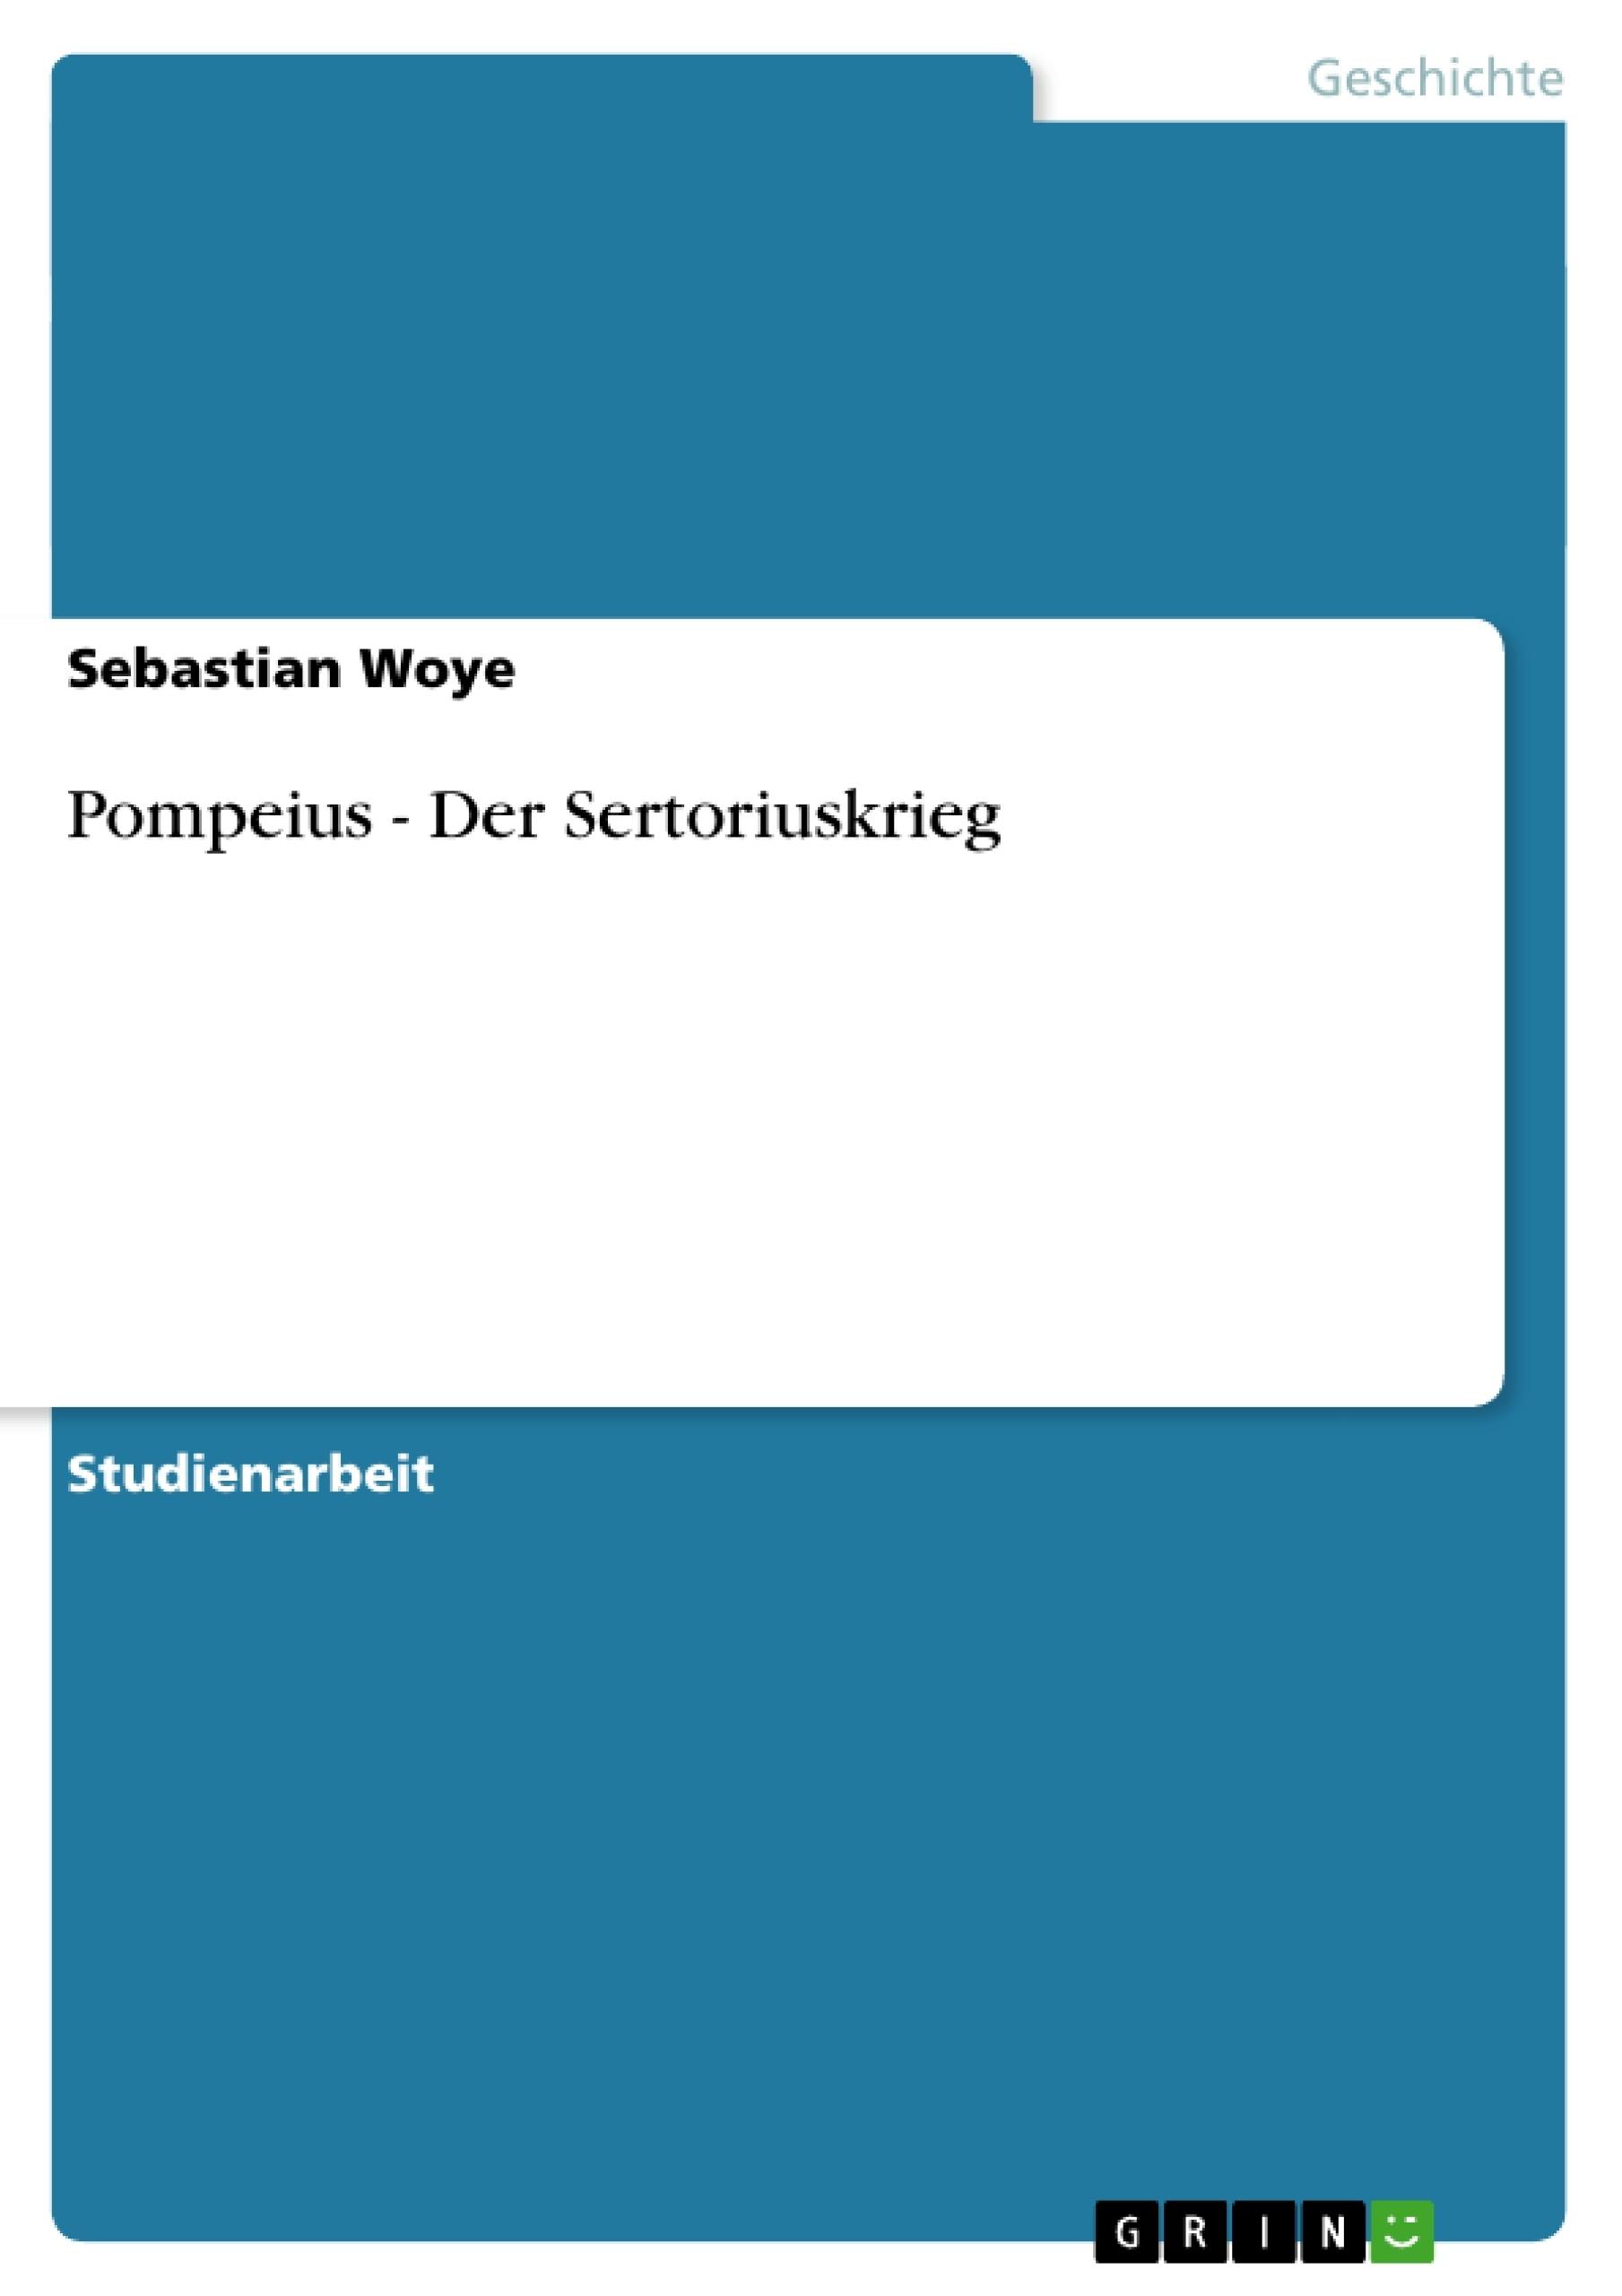 Titel: Pompeius - Der Sertoriuskrieg